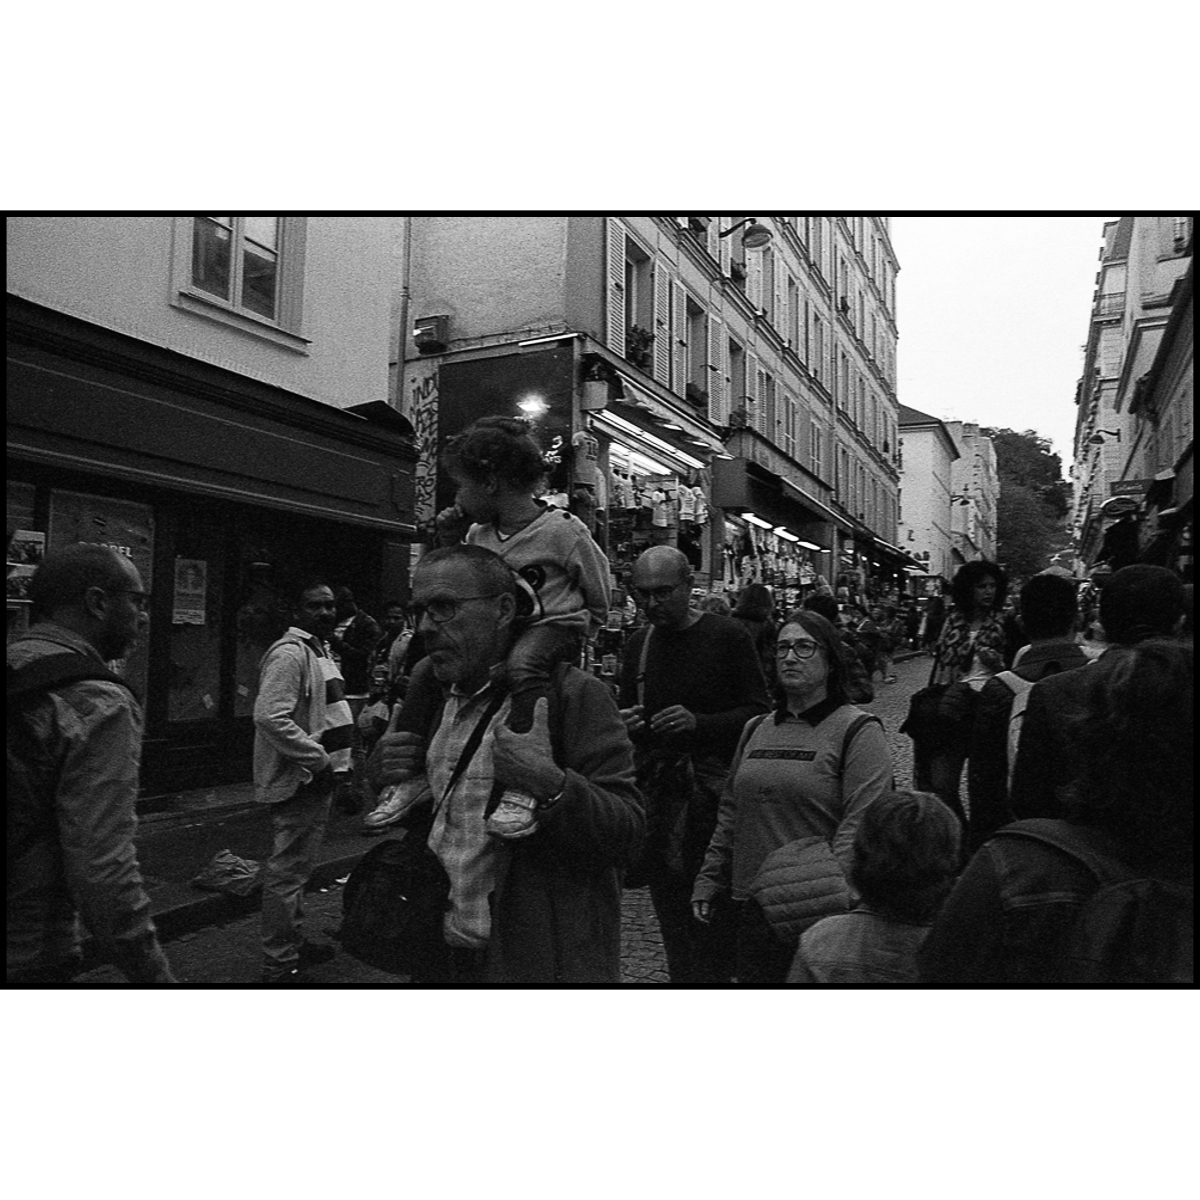 paris file-076.jpg